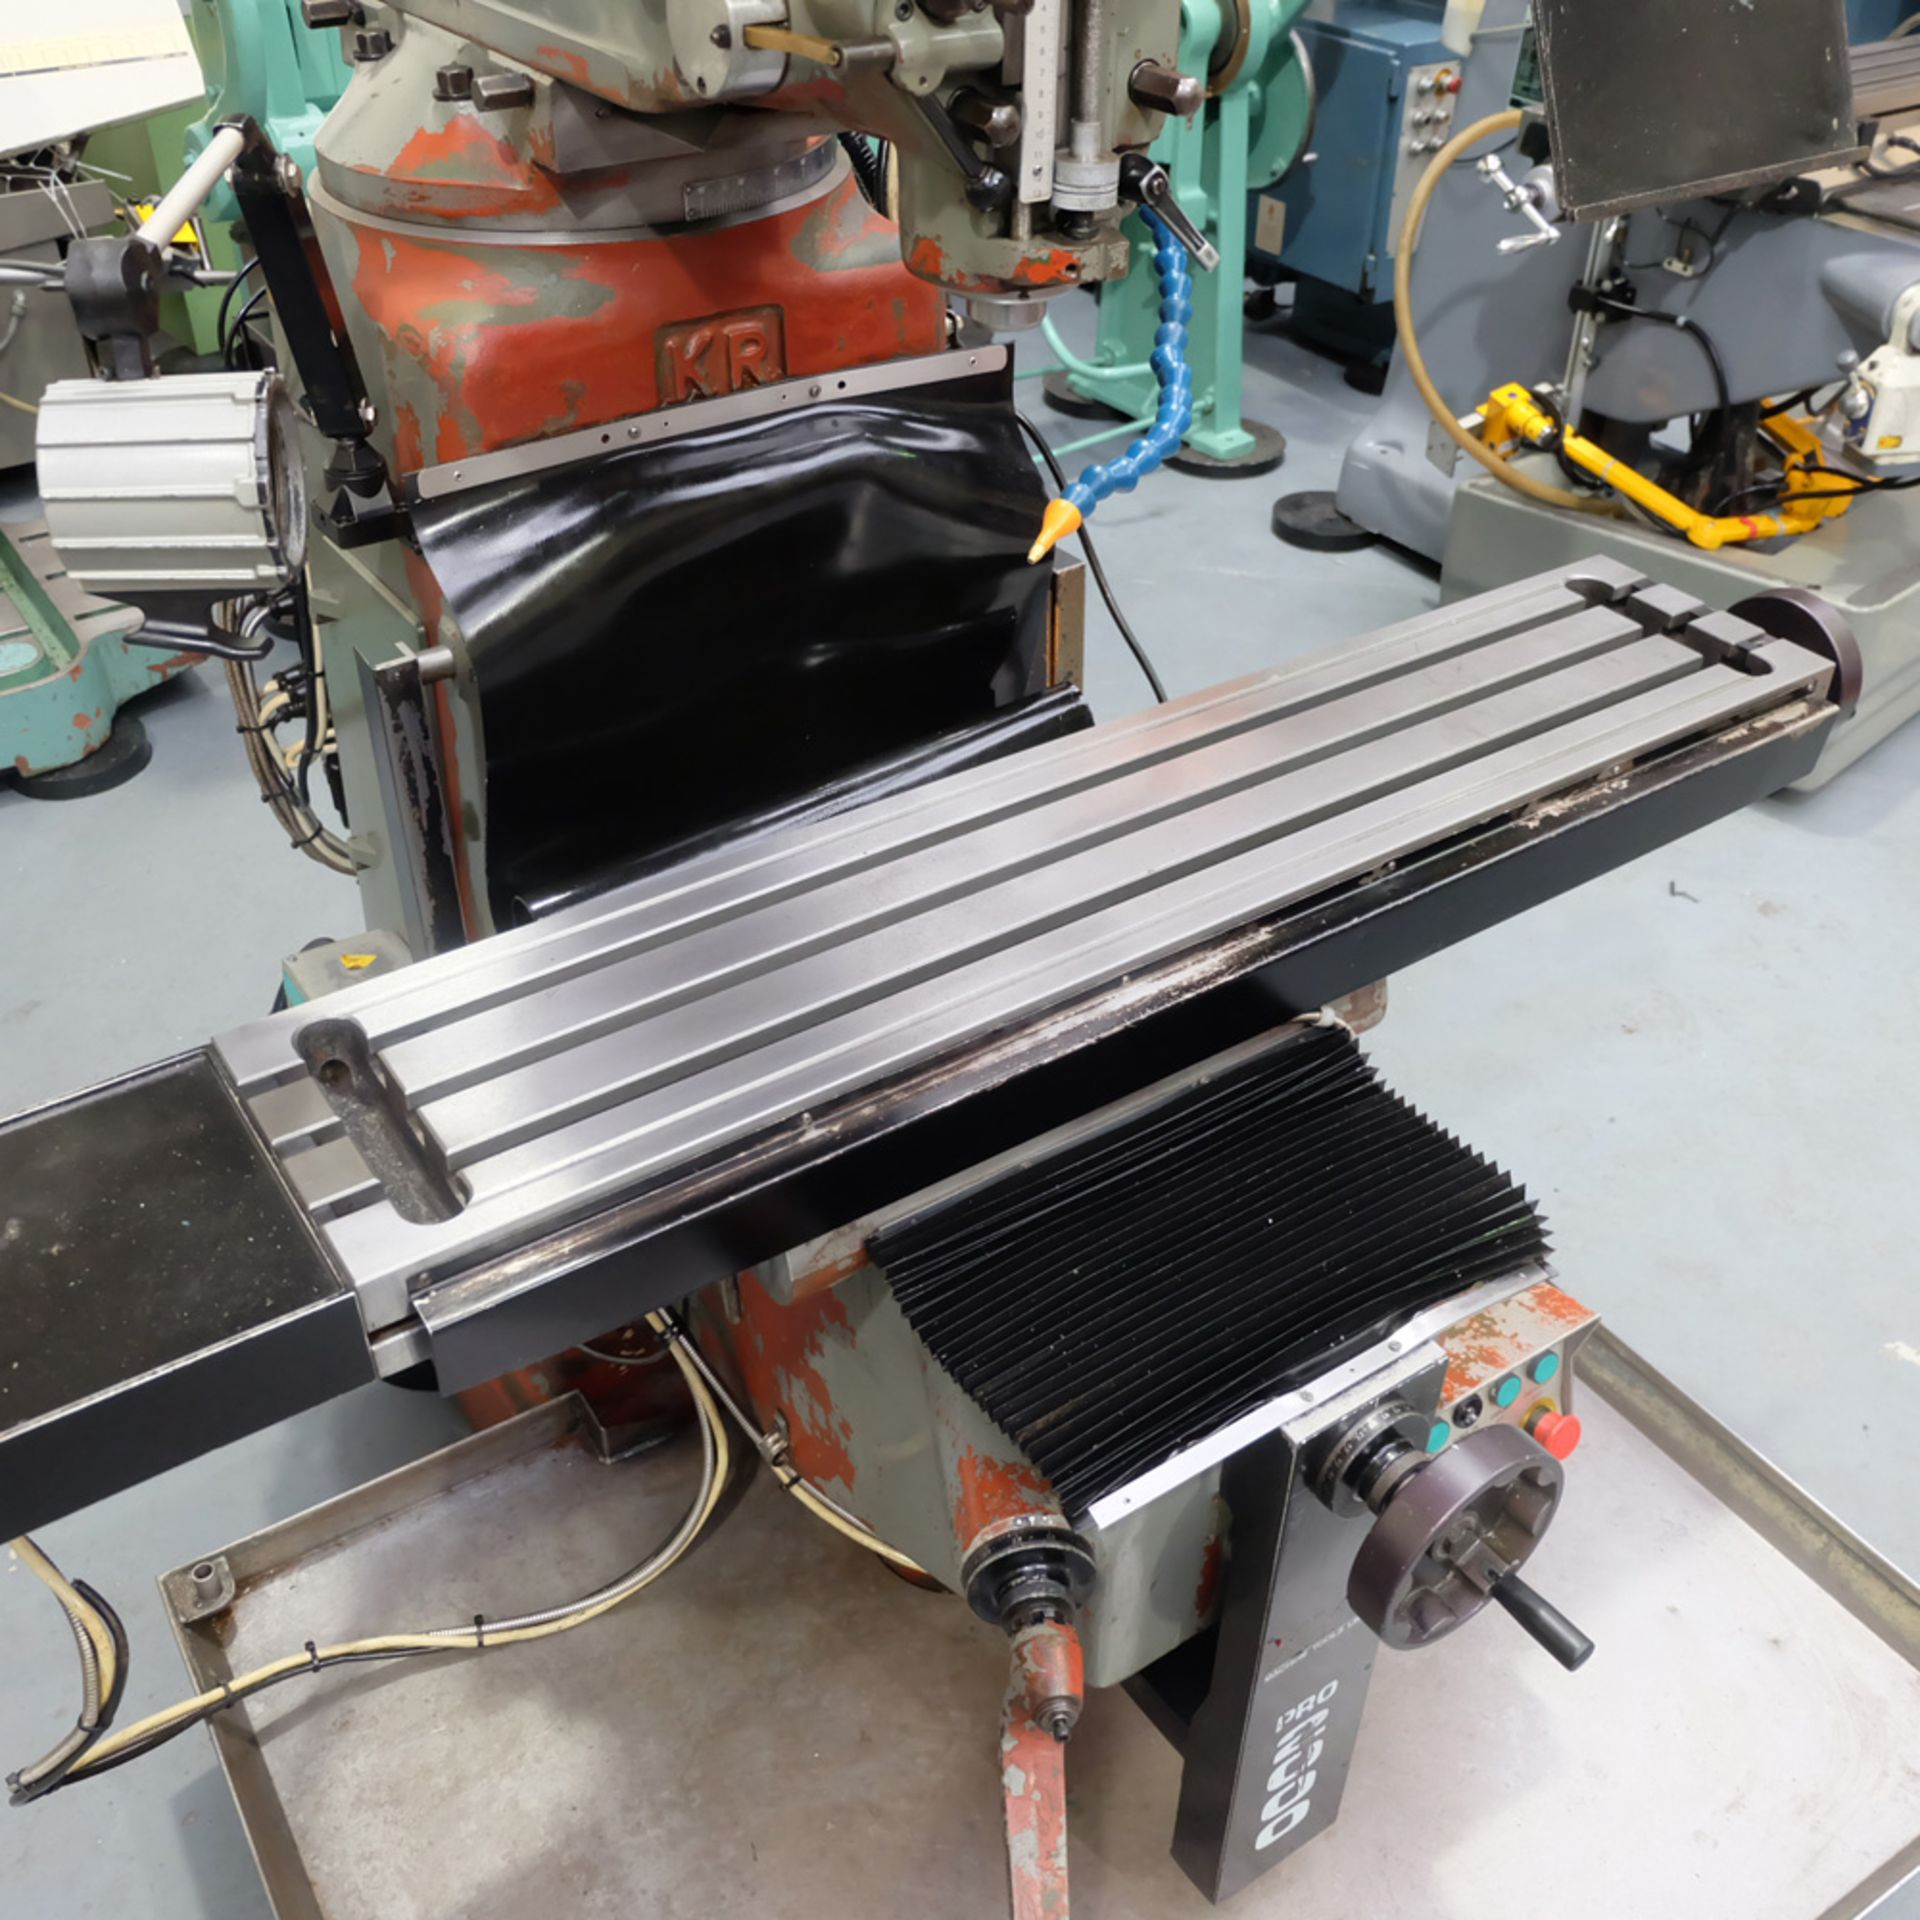 KRV Pro 2000: Turret Milling Machine. - Image 4 of 11